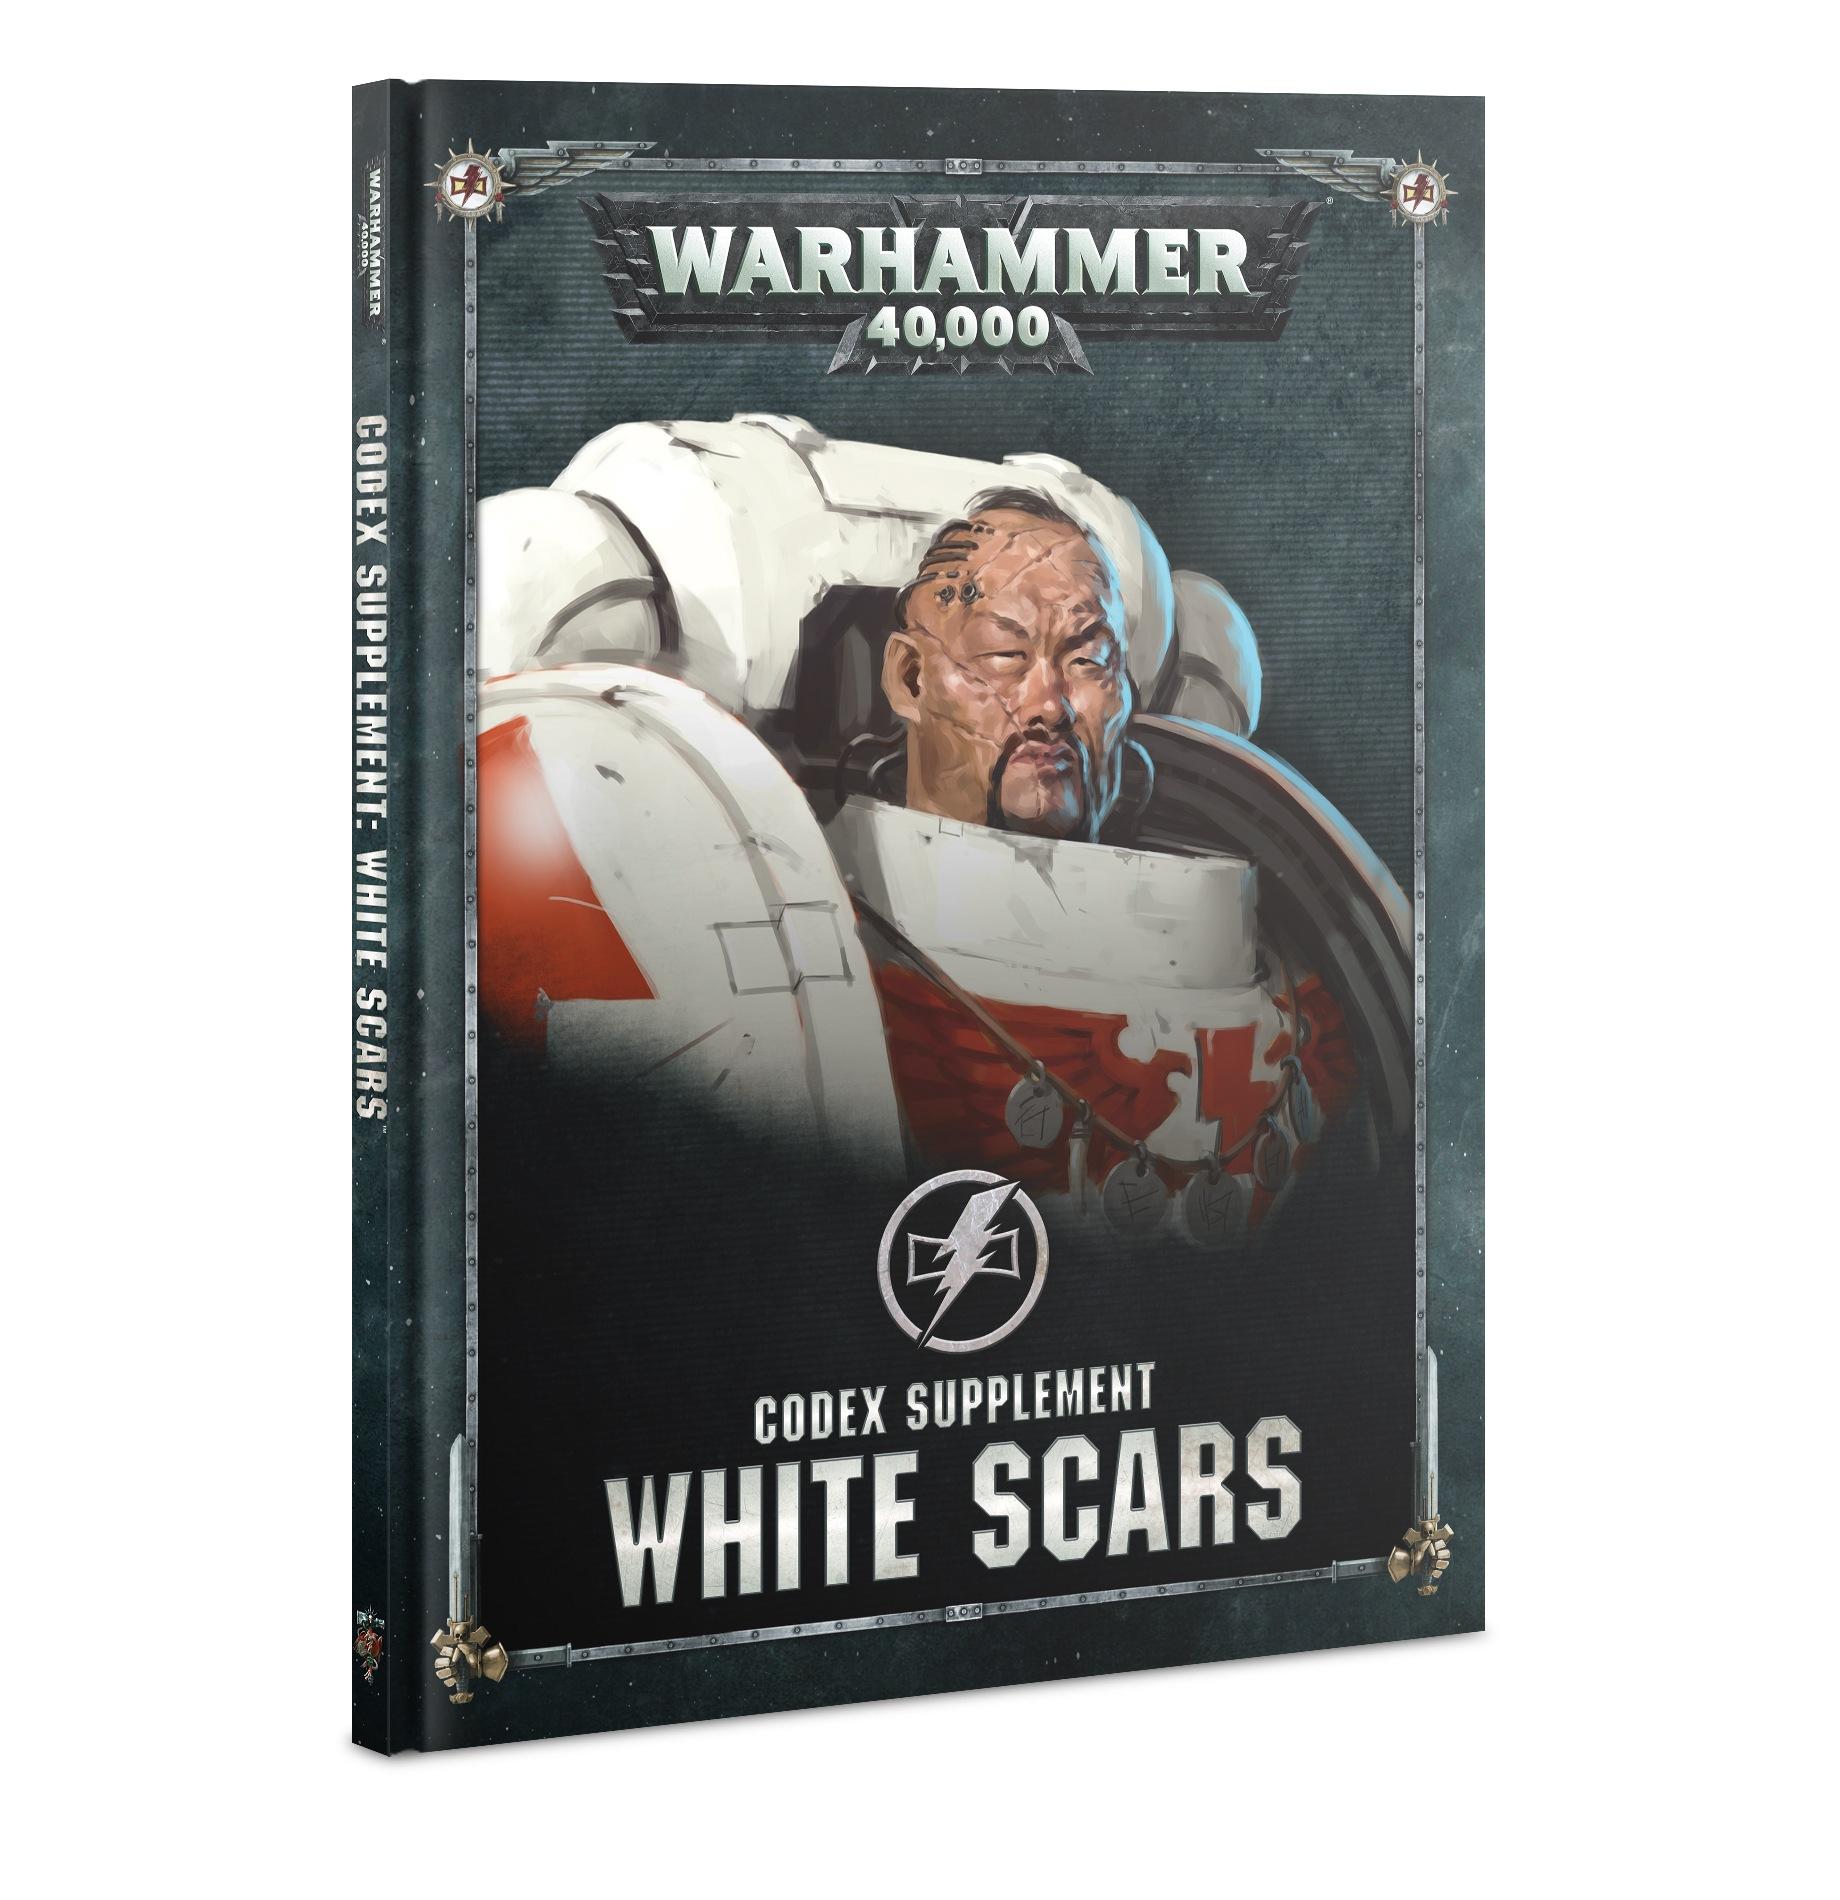 White Scars Codex